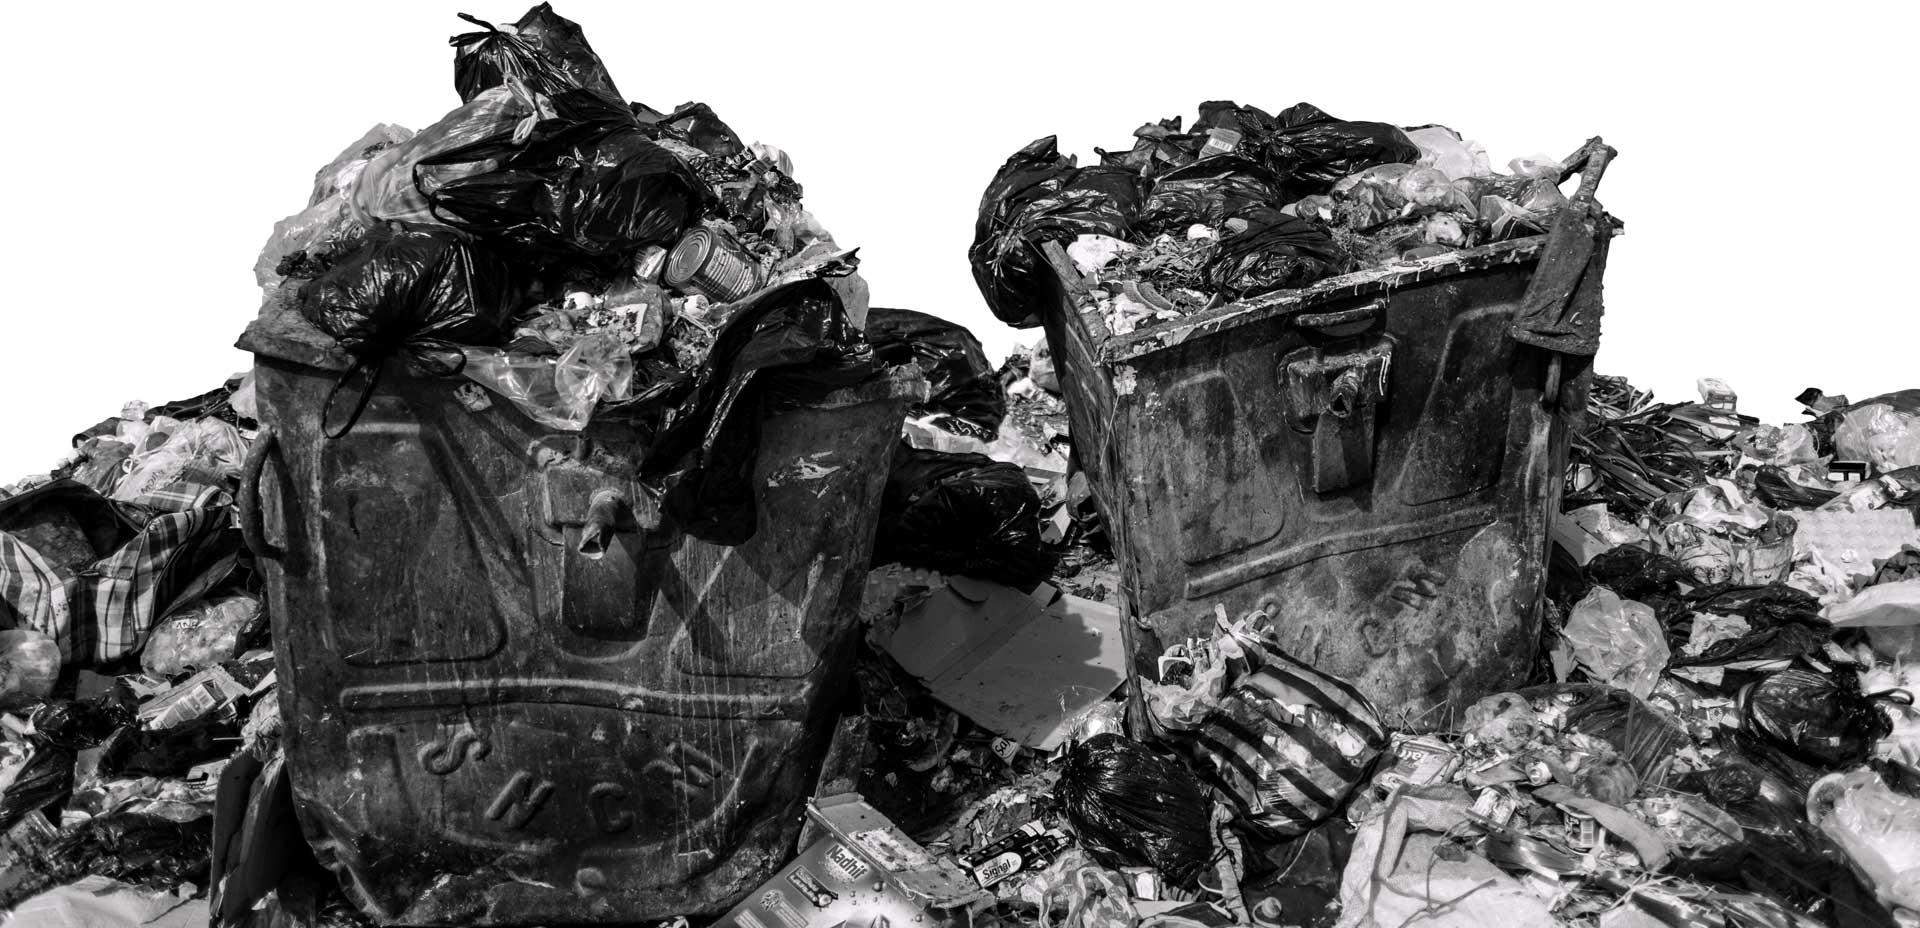 dechets-poubelles-debordent-inkyfada